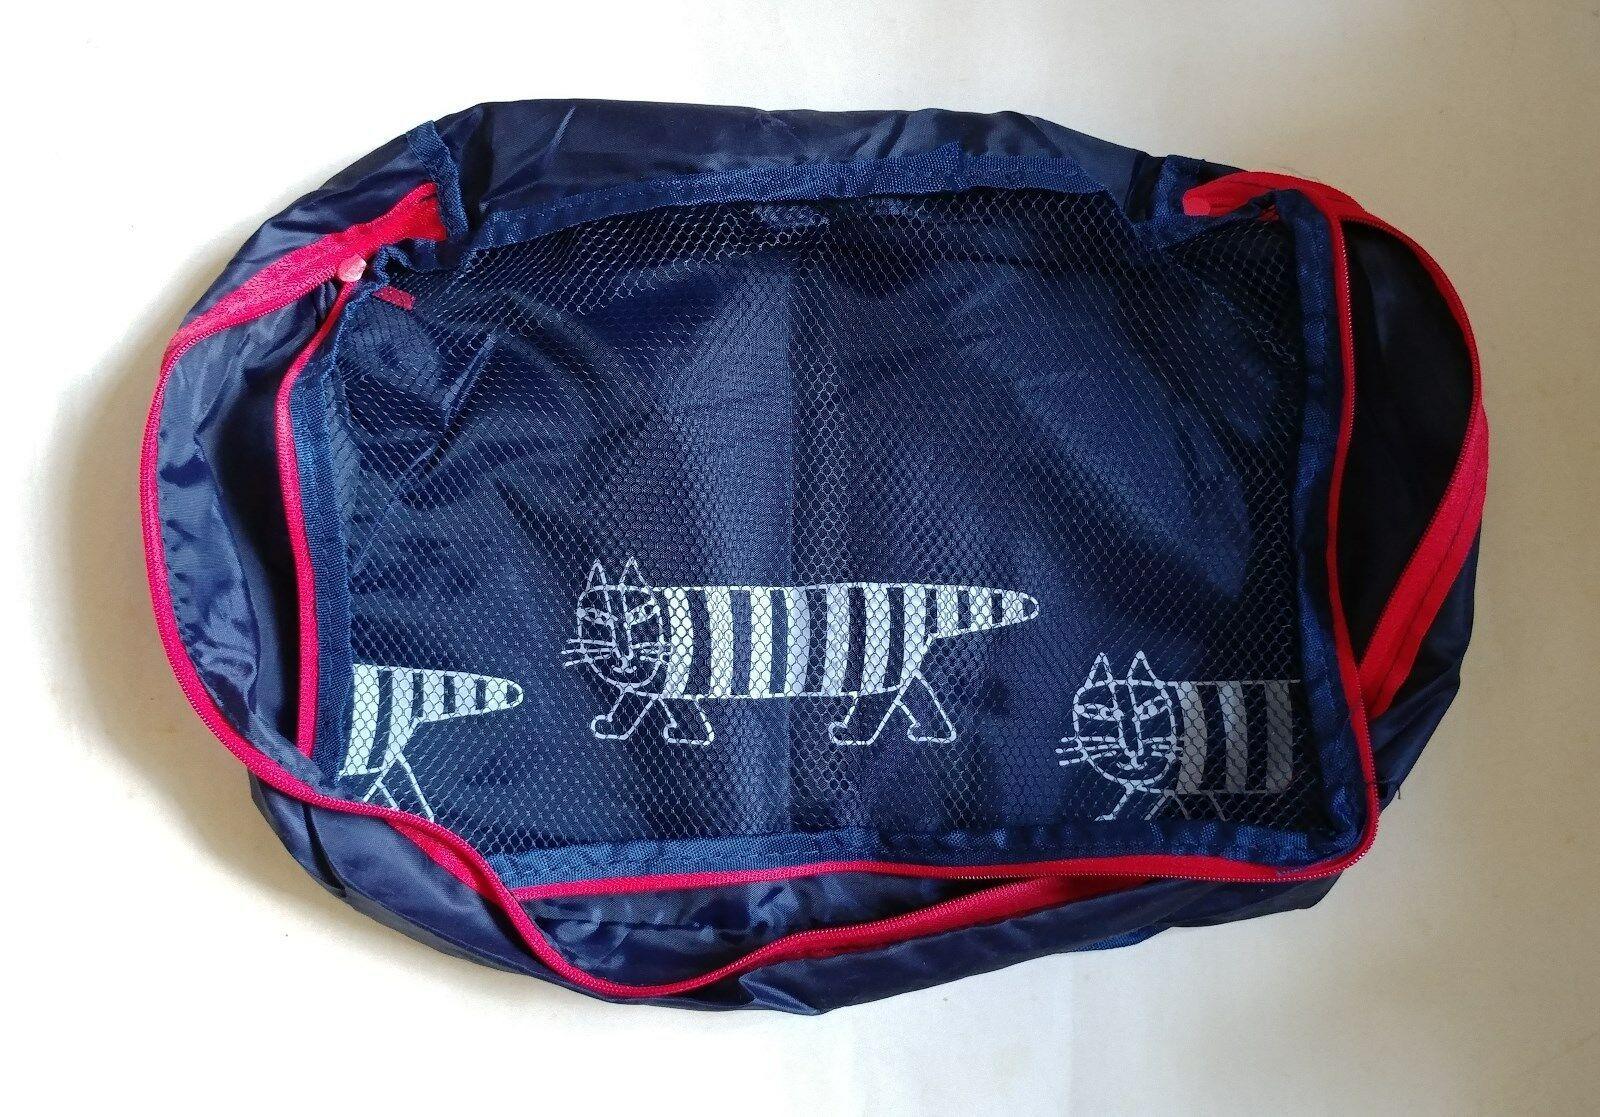 LISA LARSON MIKEY Pocketable Travel Case Cosmetic Wash Bag from Japan Magazine